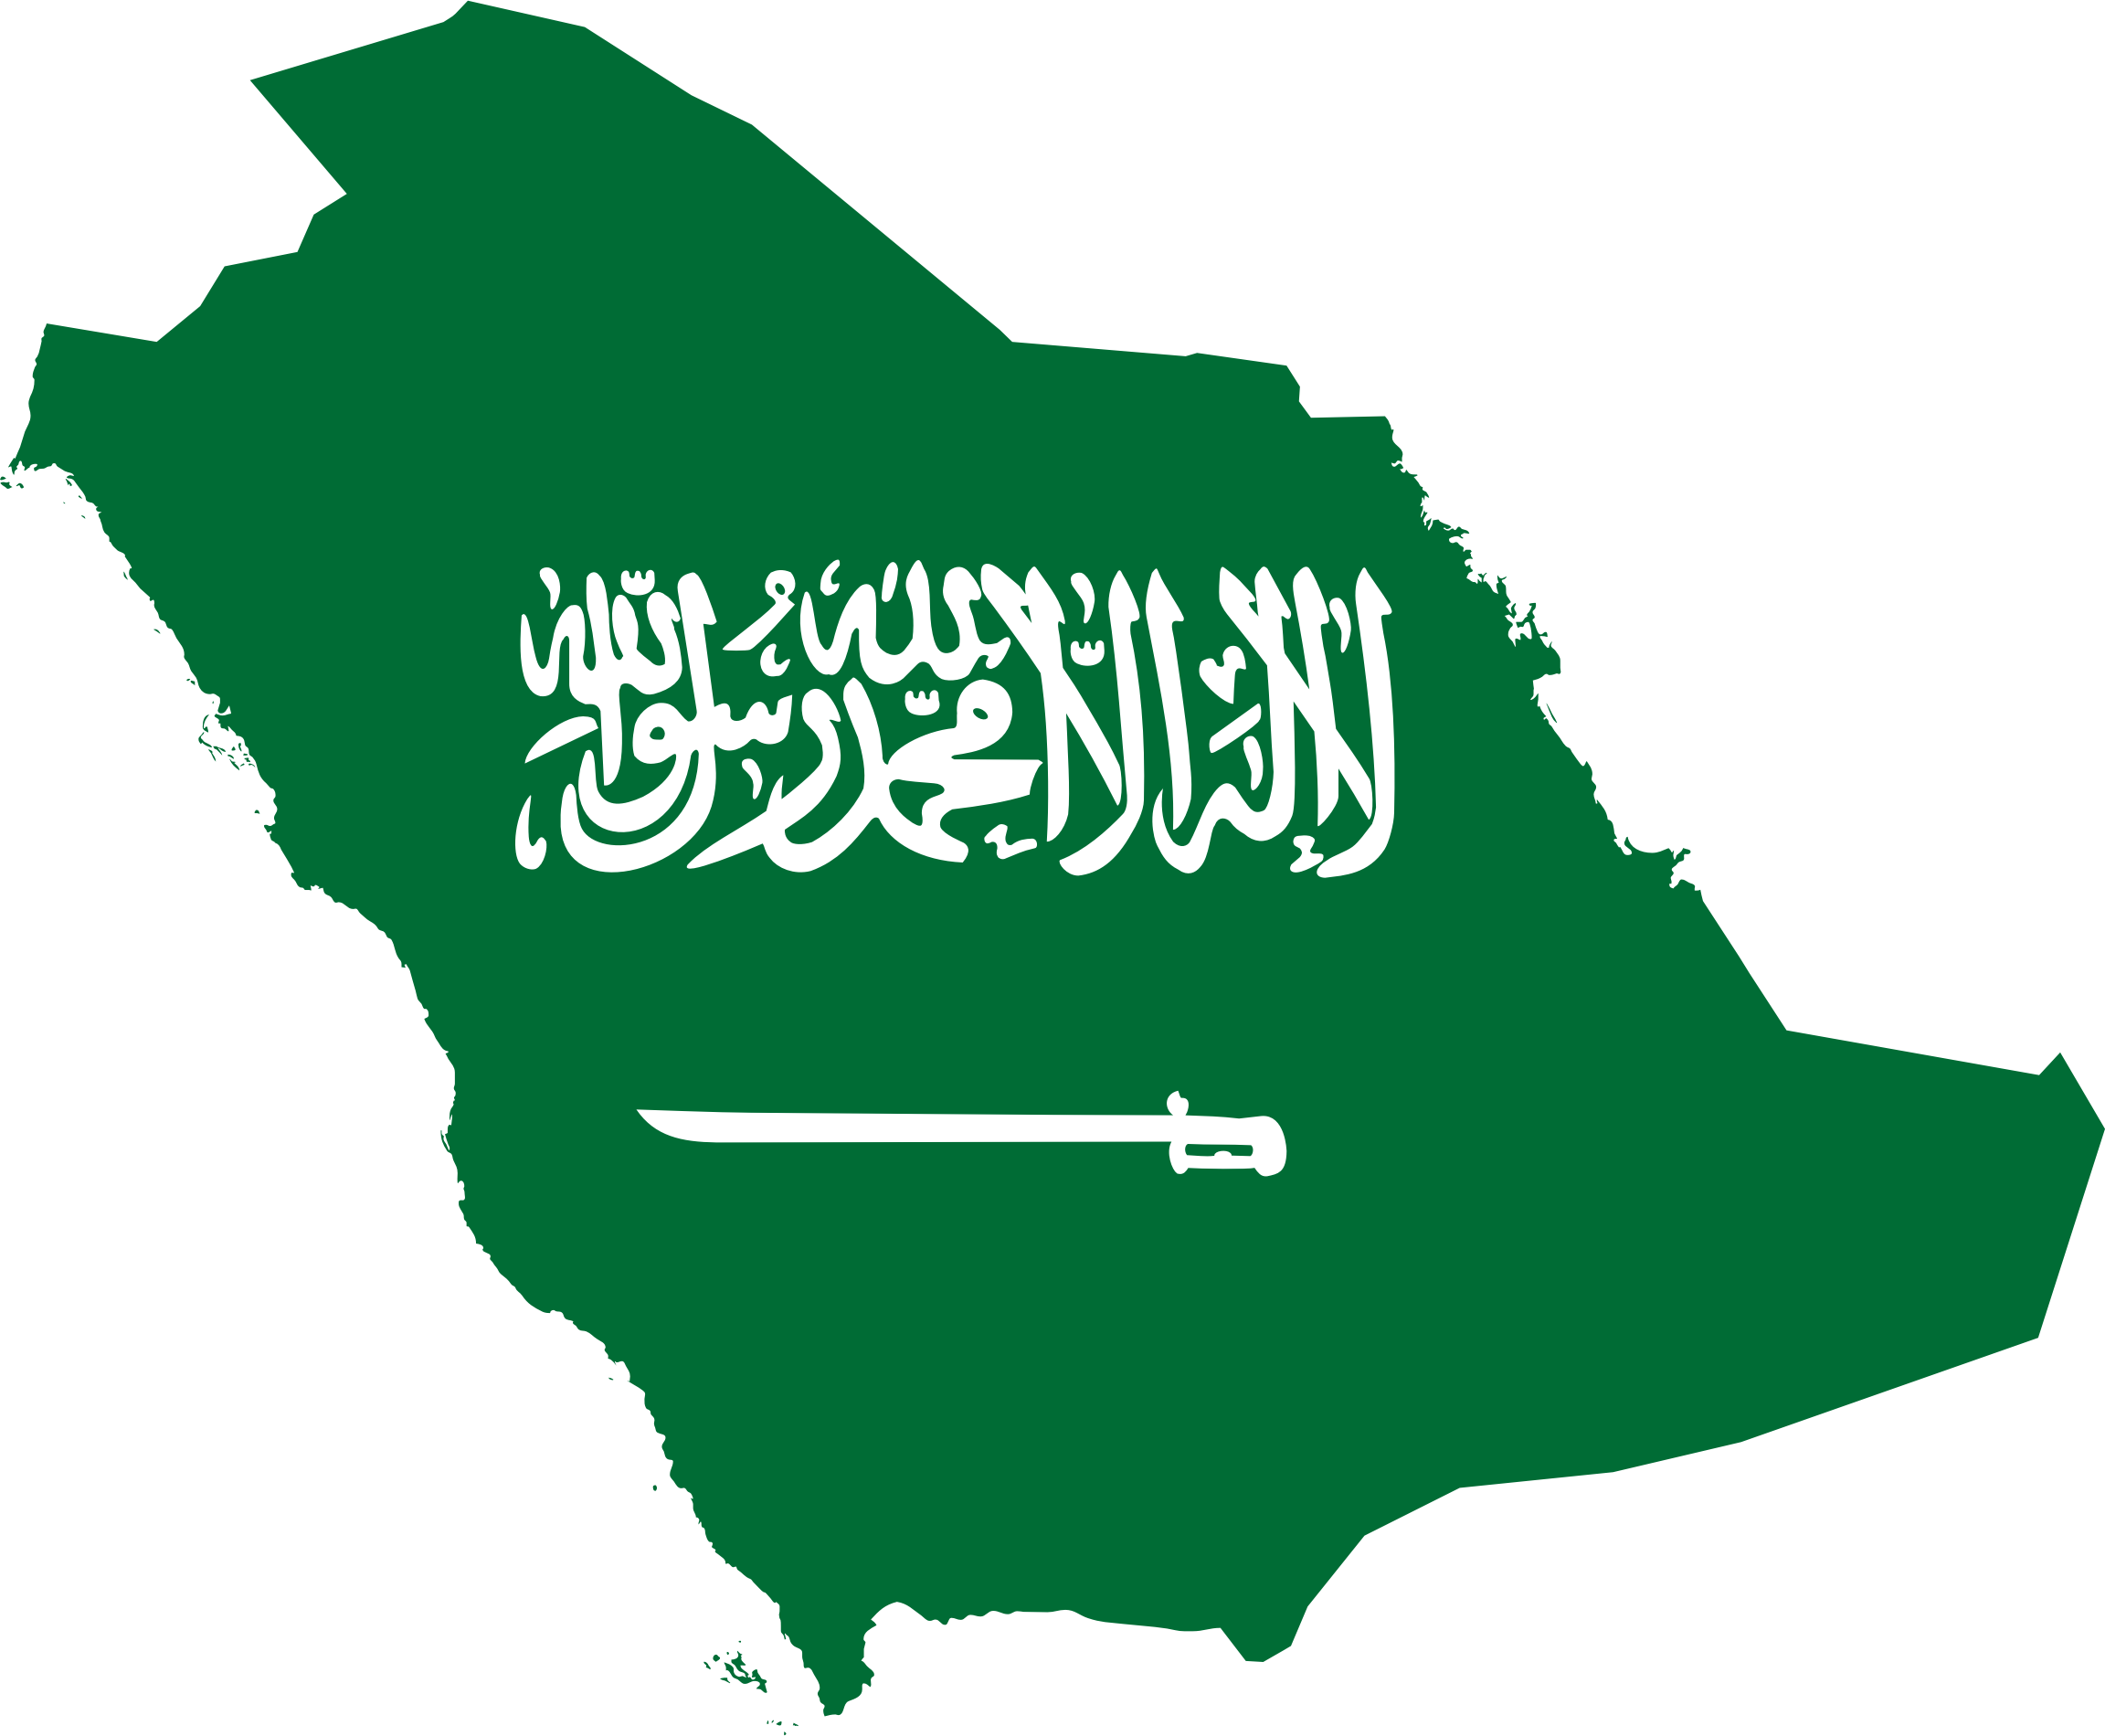 Saudi Arabia Map Flag By Gdj Saudi Flag Cover Photo Quotes National Day Saudi